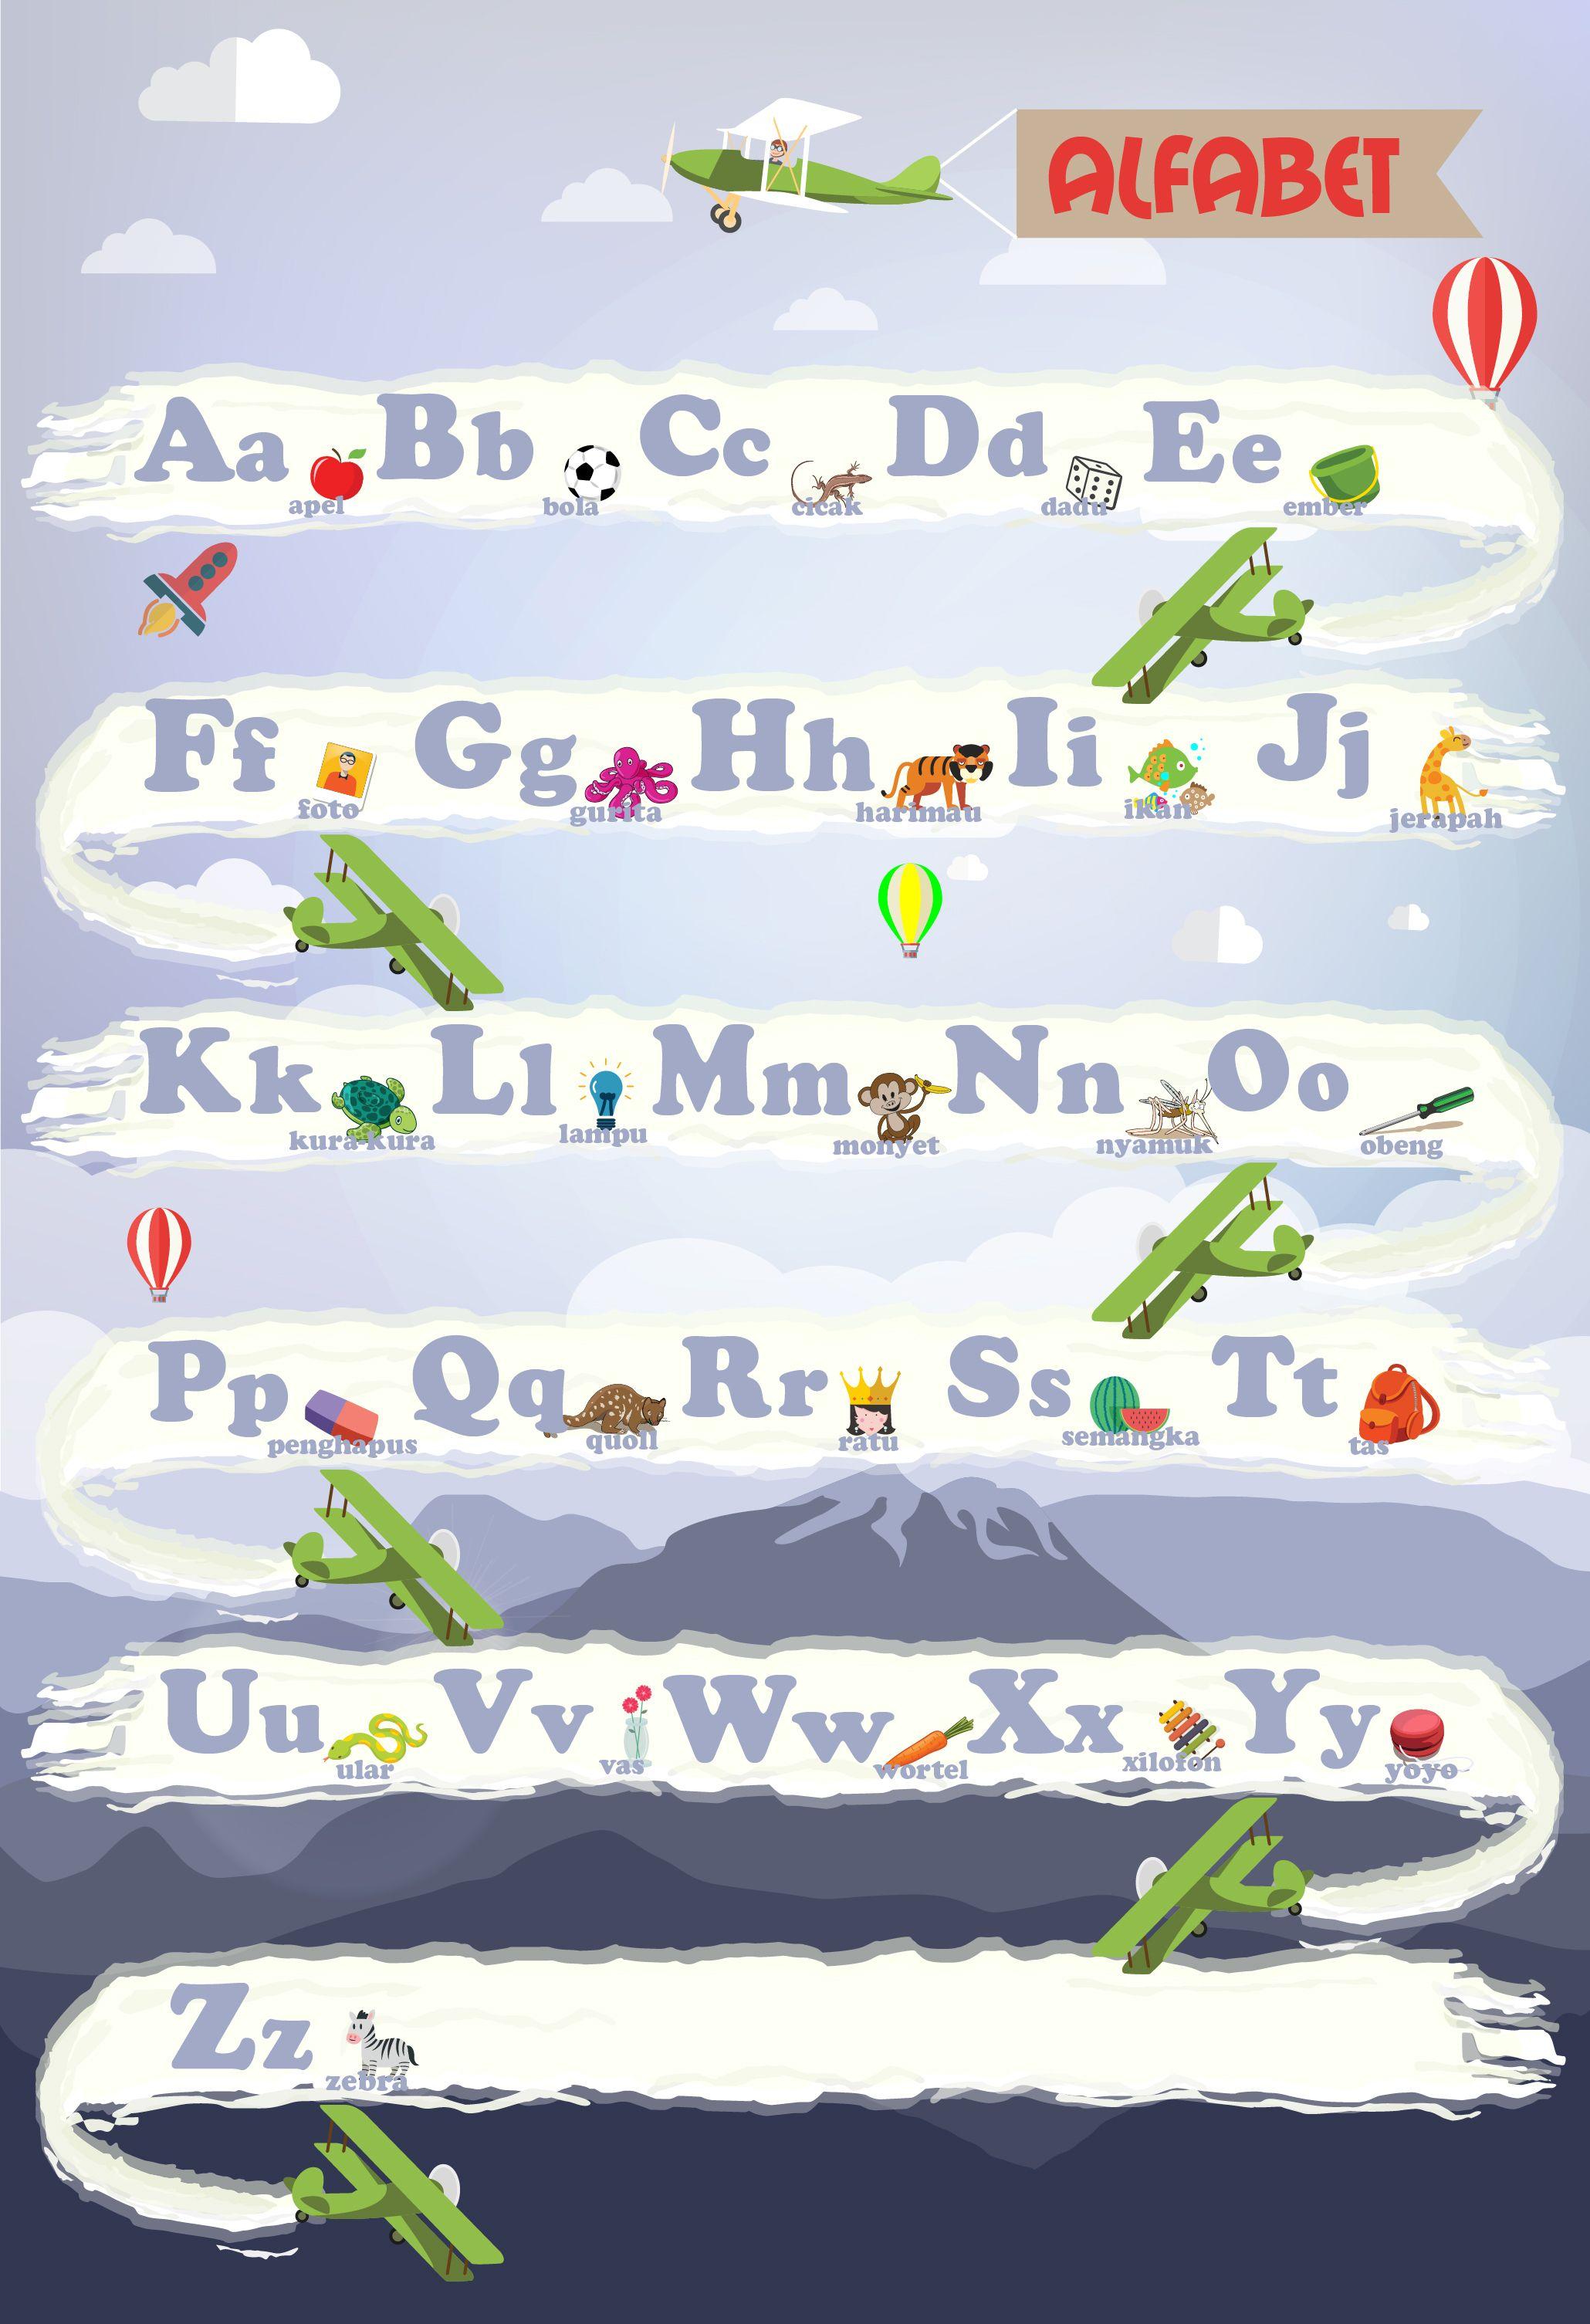 Indonesia Kids Alphabetic Poster Poster Alphabet Kids